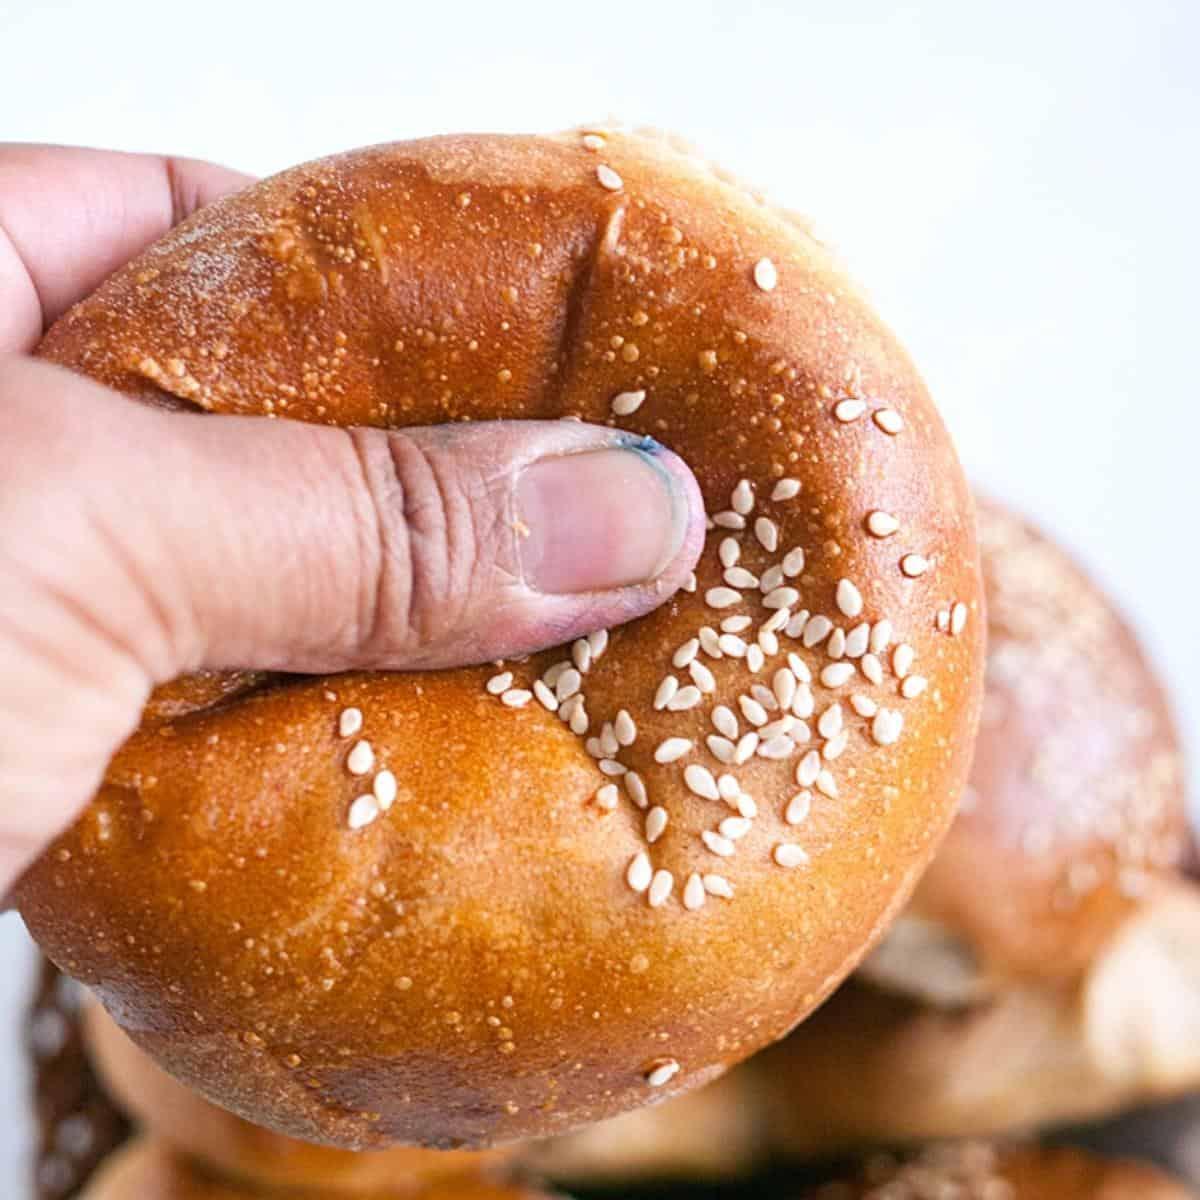 Soft burger buns in a basket.